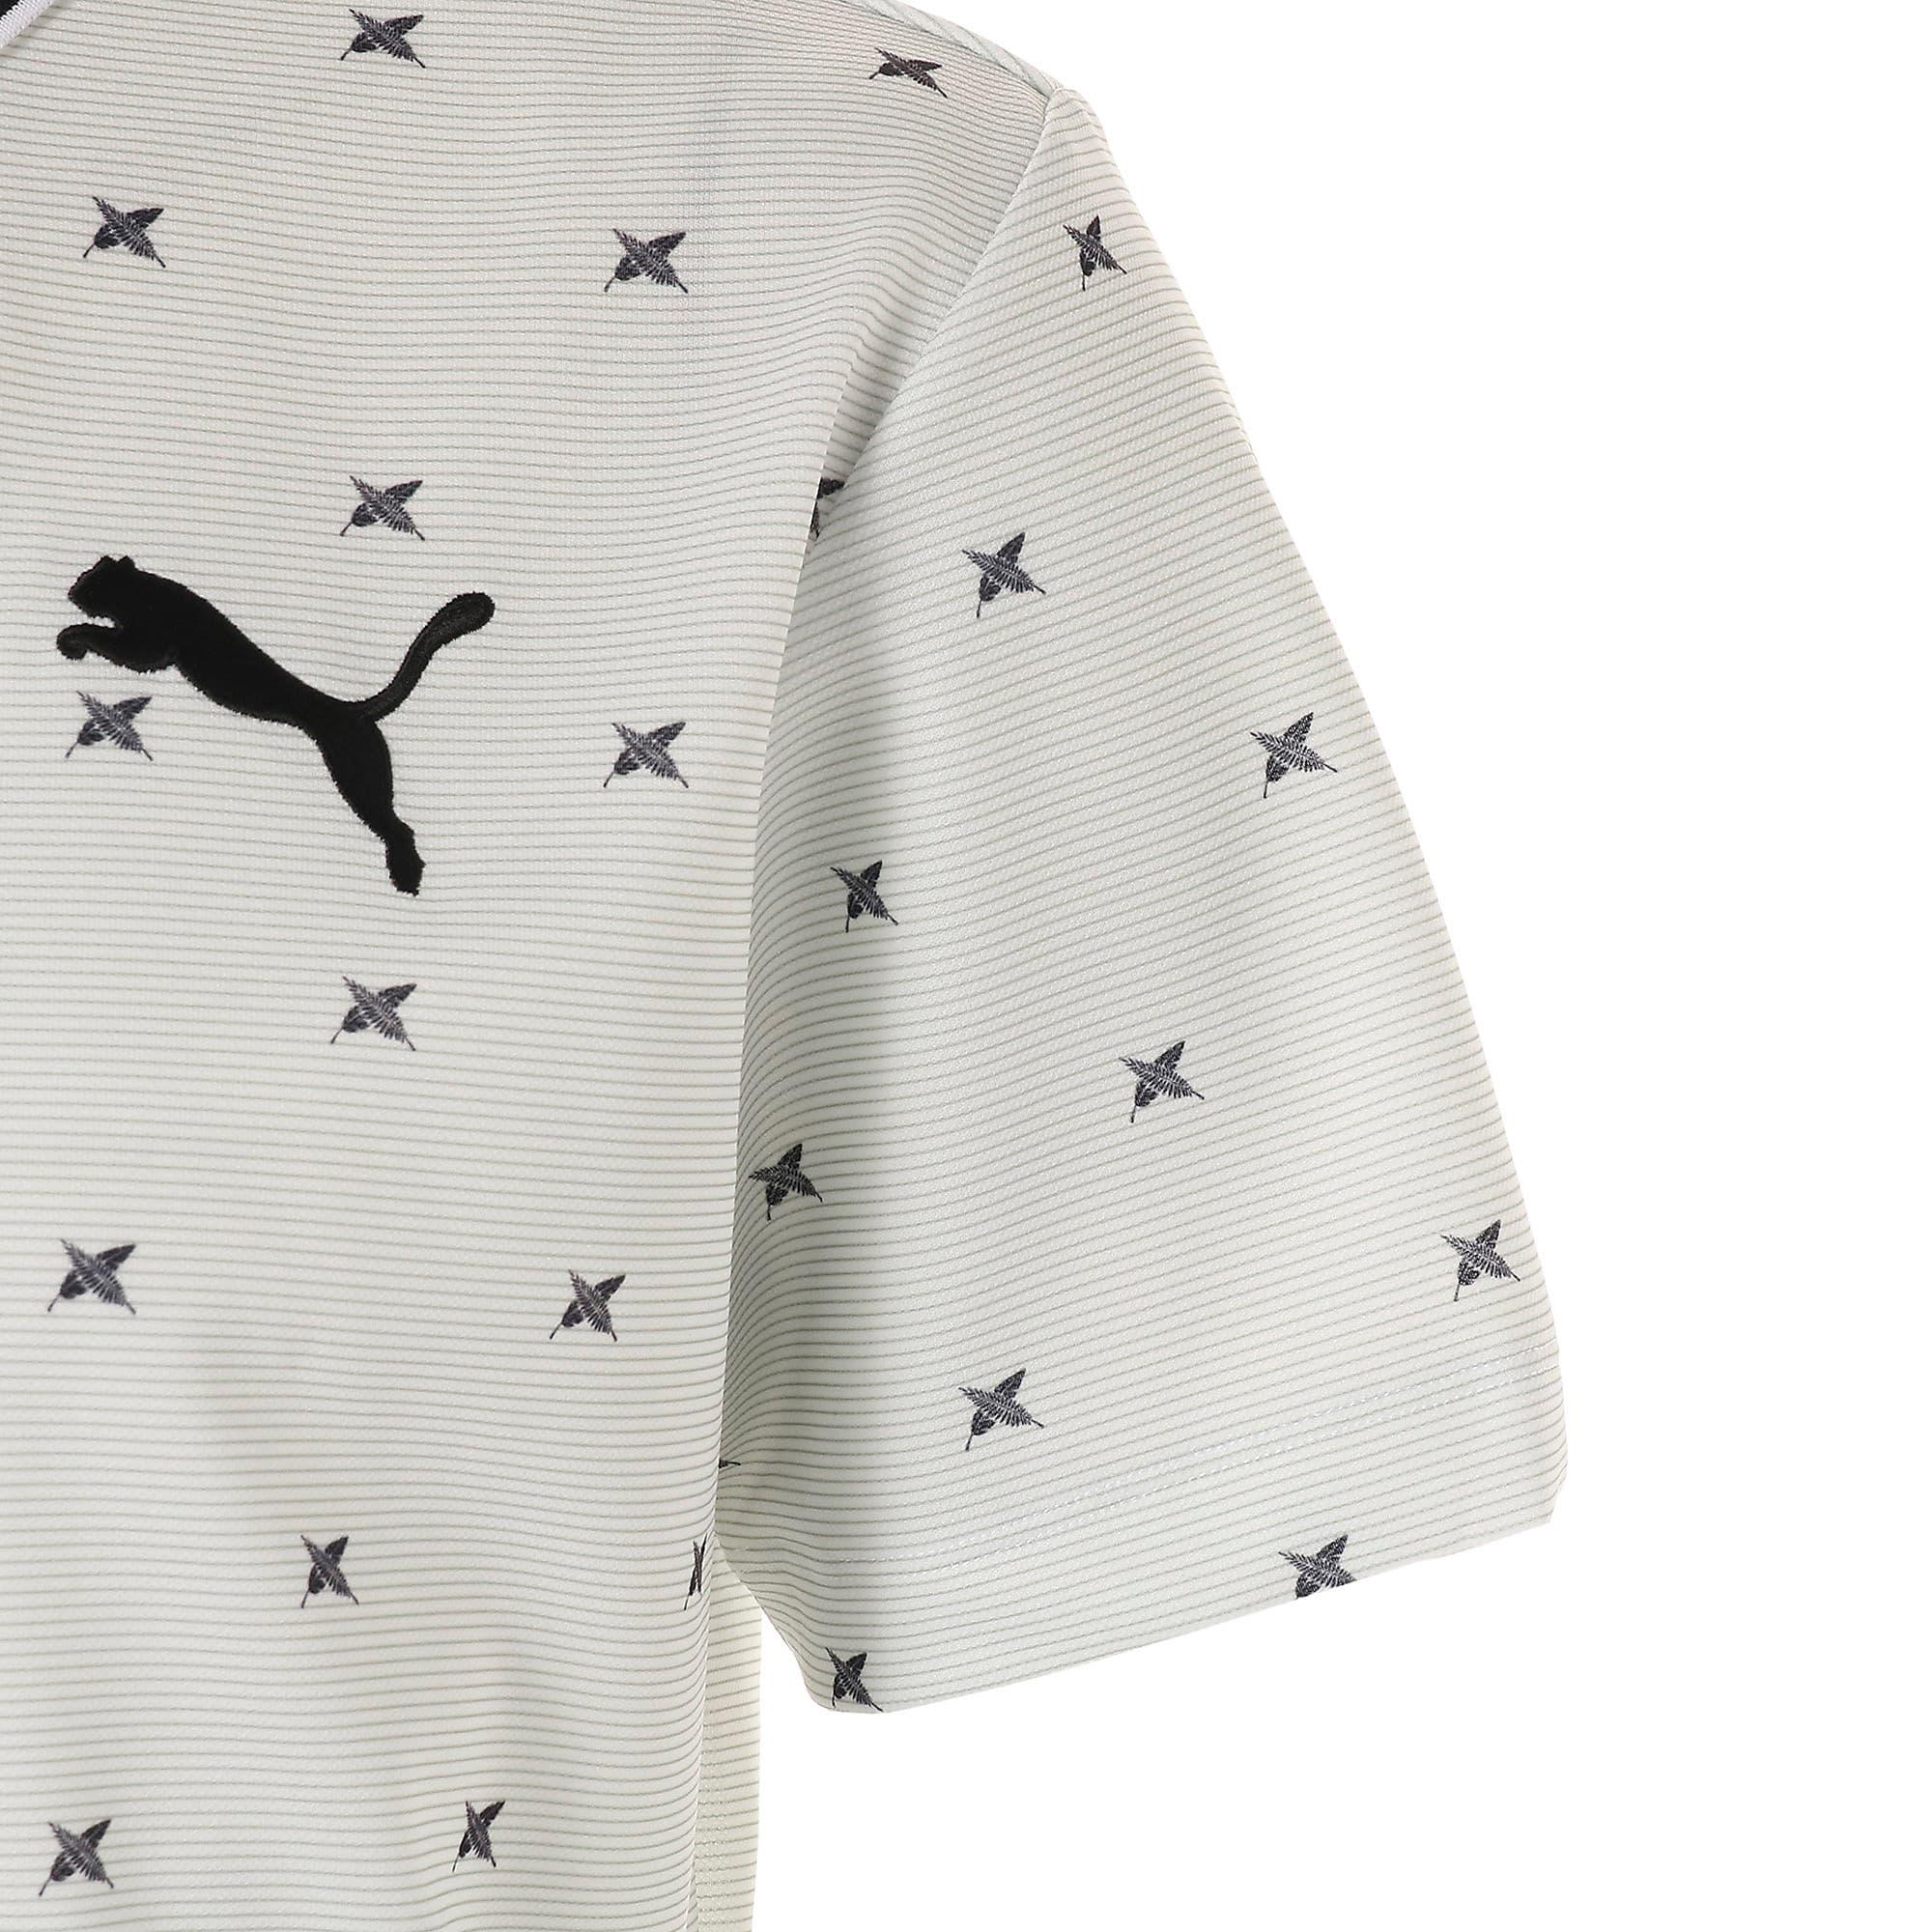 Thumbnail 5 of ゴルフ フェザーフュージョン SSポロシャツ 半袖, Bright White, medium-JPN